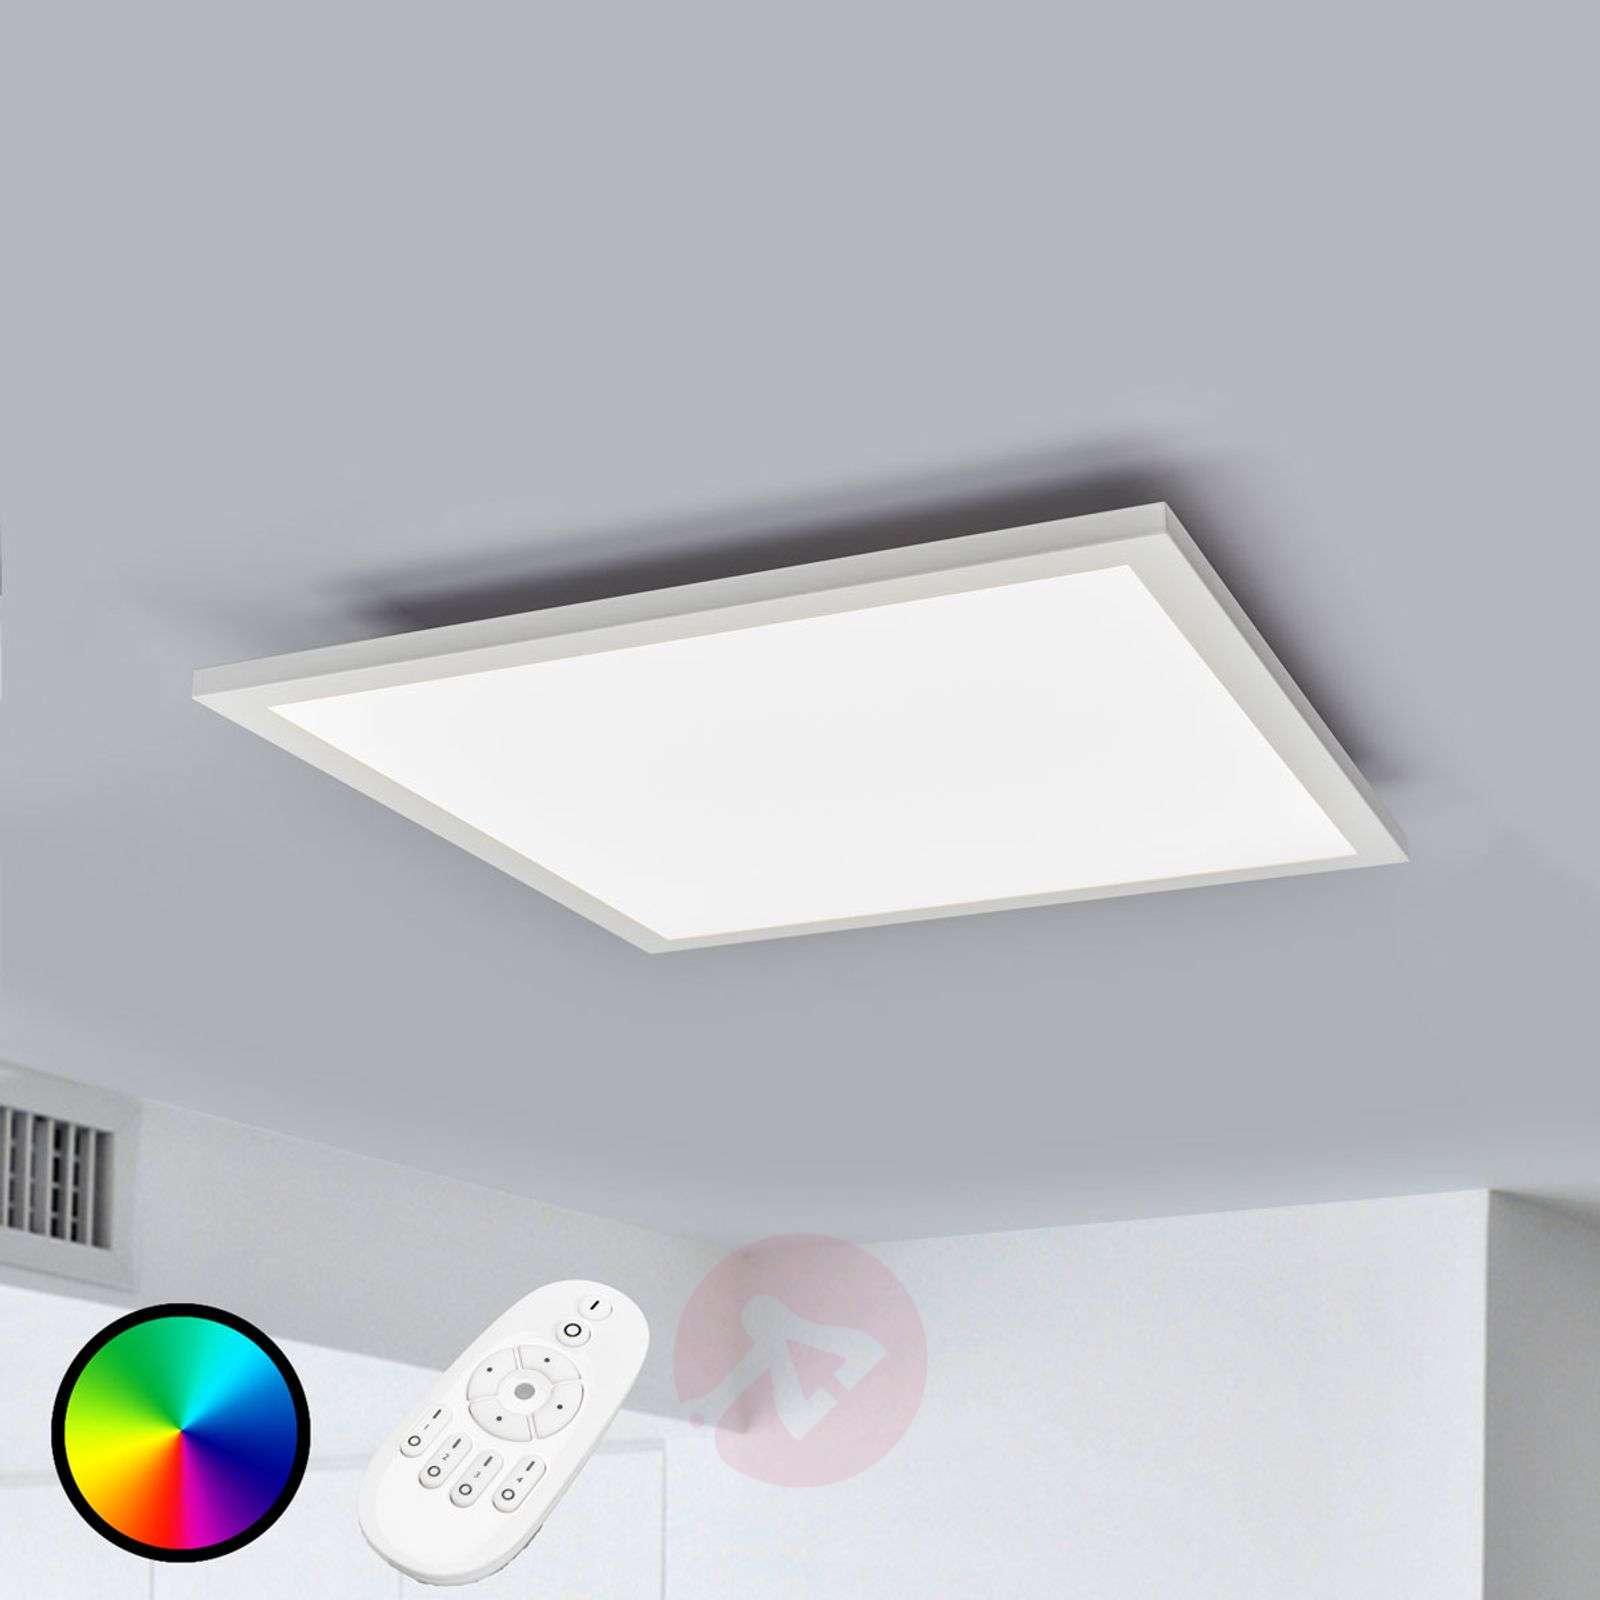 RGB-LED-paneeli Milian kaukosäädöllä-7620028-02